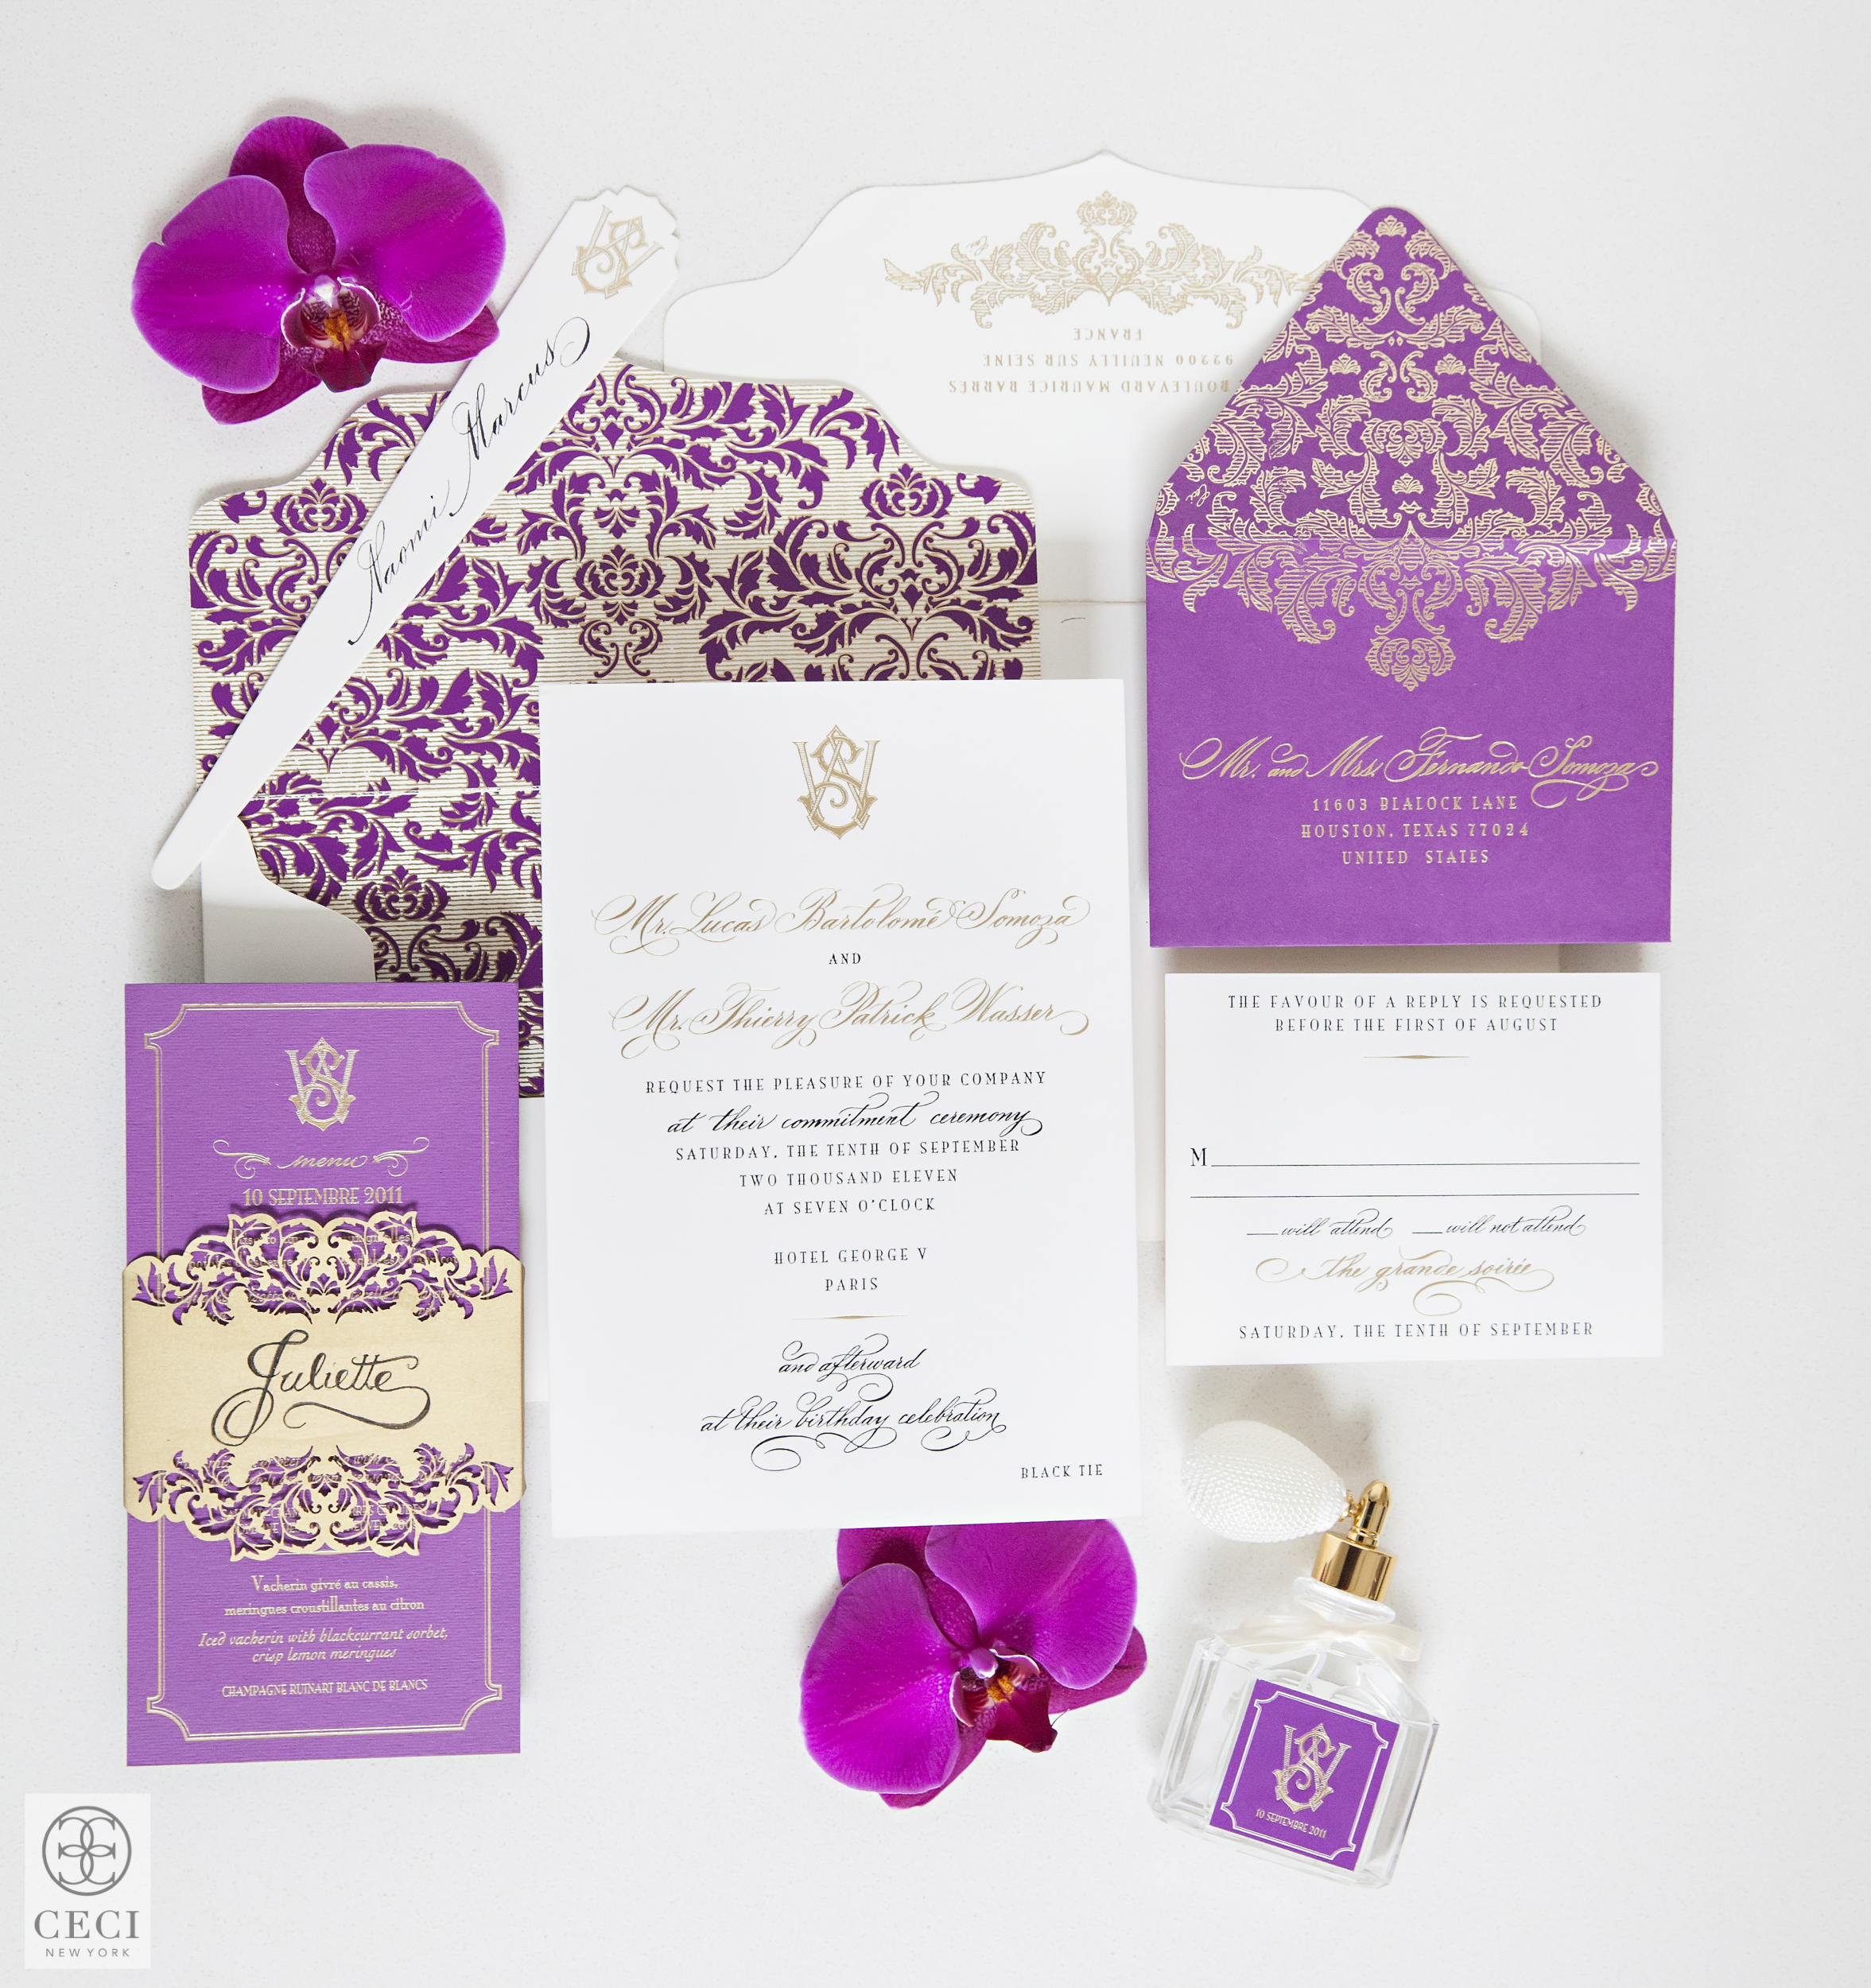 ceci_new_york_lucas_somoza_purple_regal_wediding_birthday_commitment_ceremony_gold-5.jpg